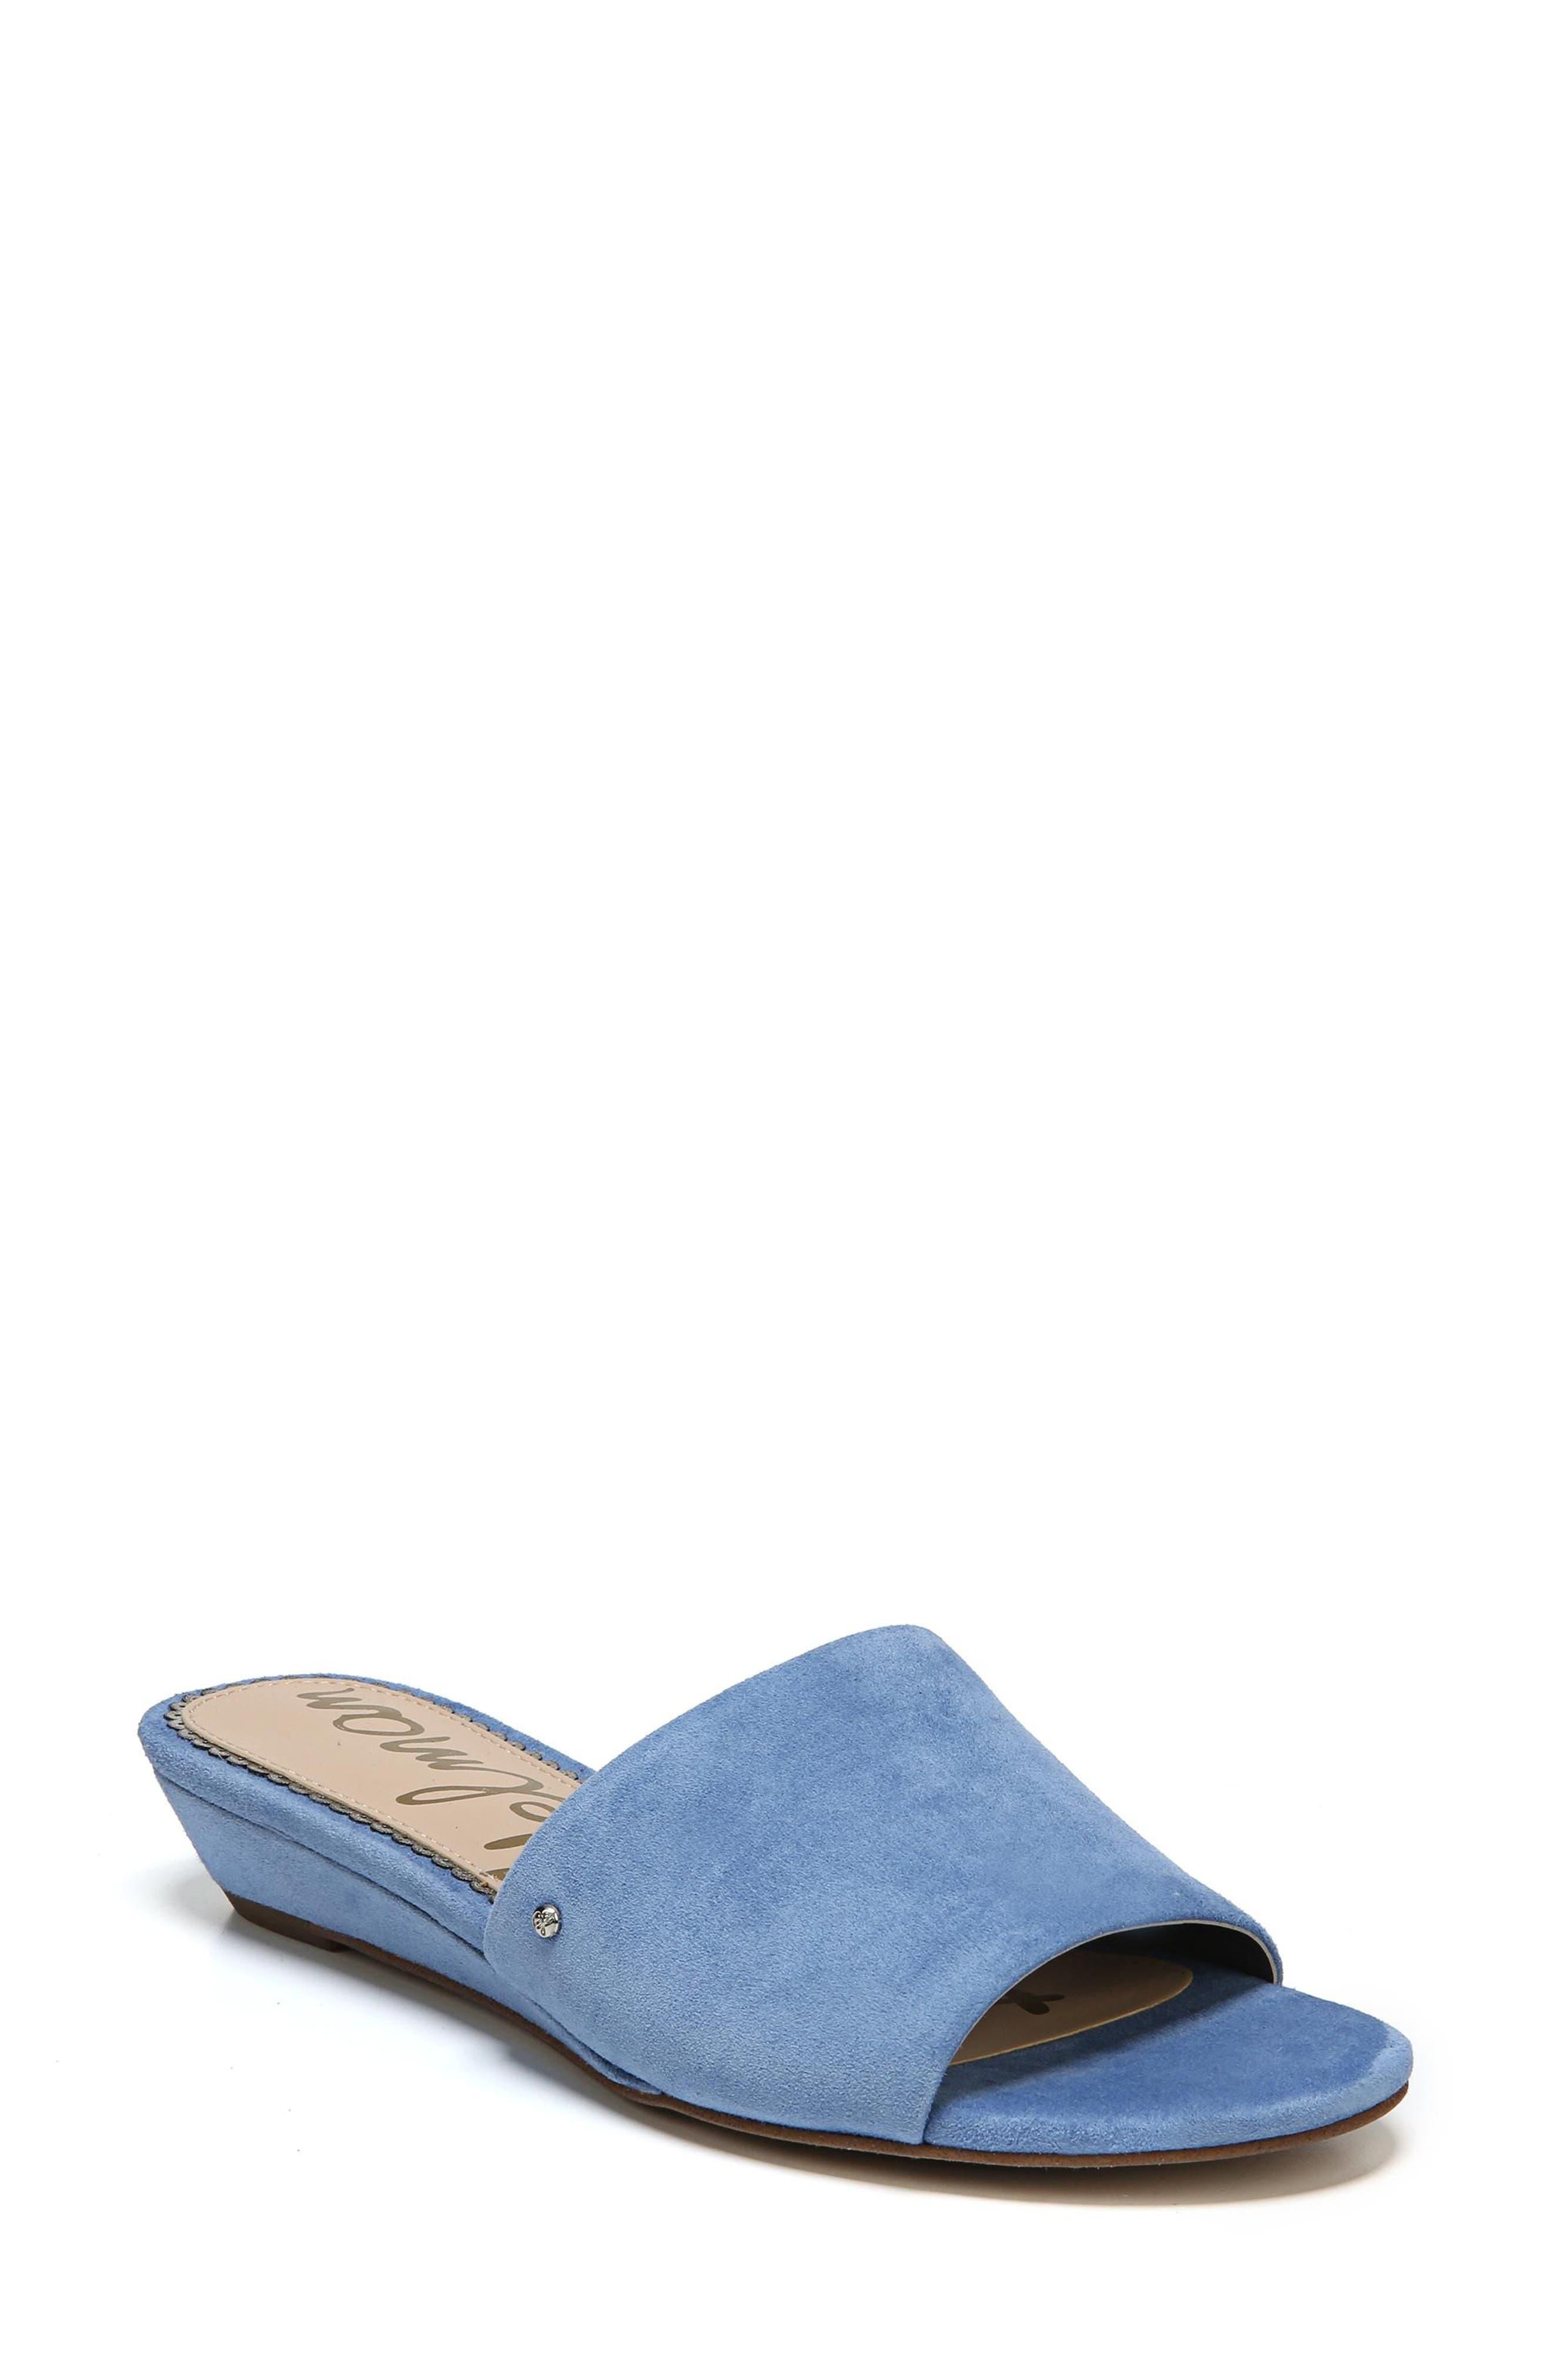 9e2ed518bc18 Sam Edelman Women S Liliana Suede Demi Wedge Slide Sandals In Denim Blue  Suede